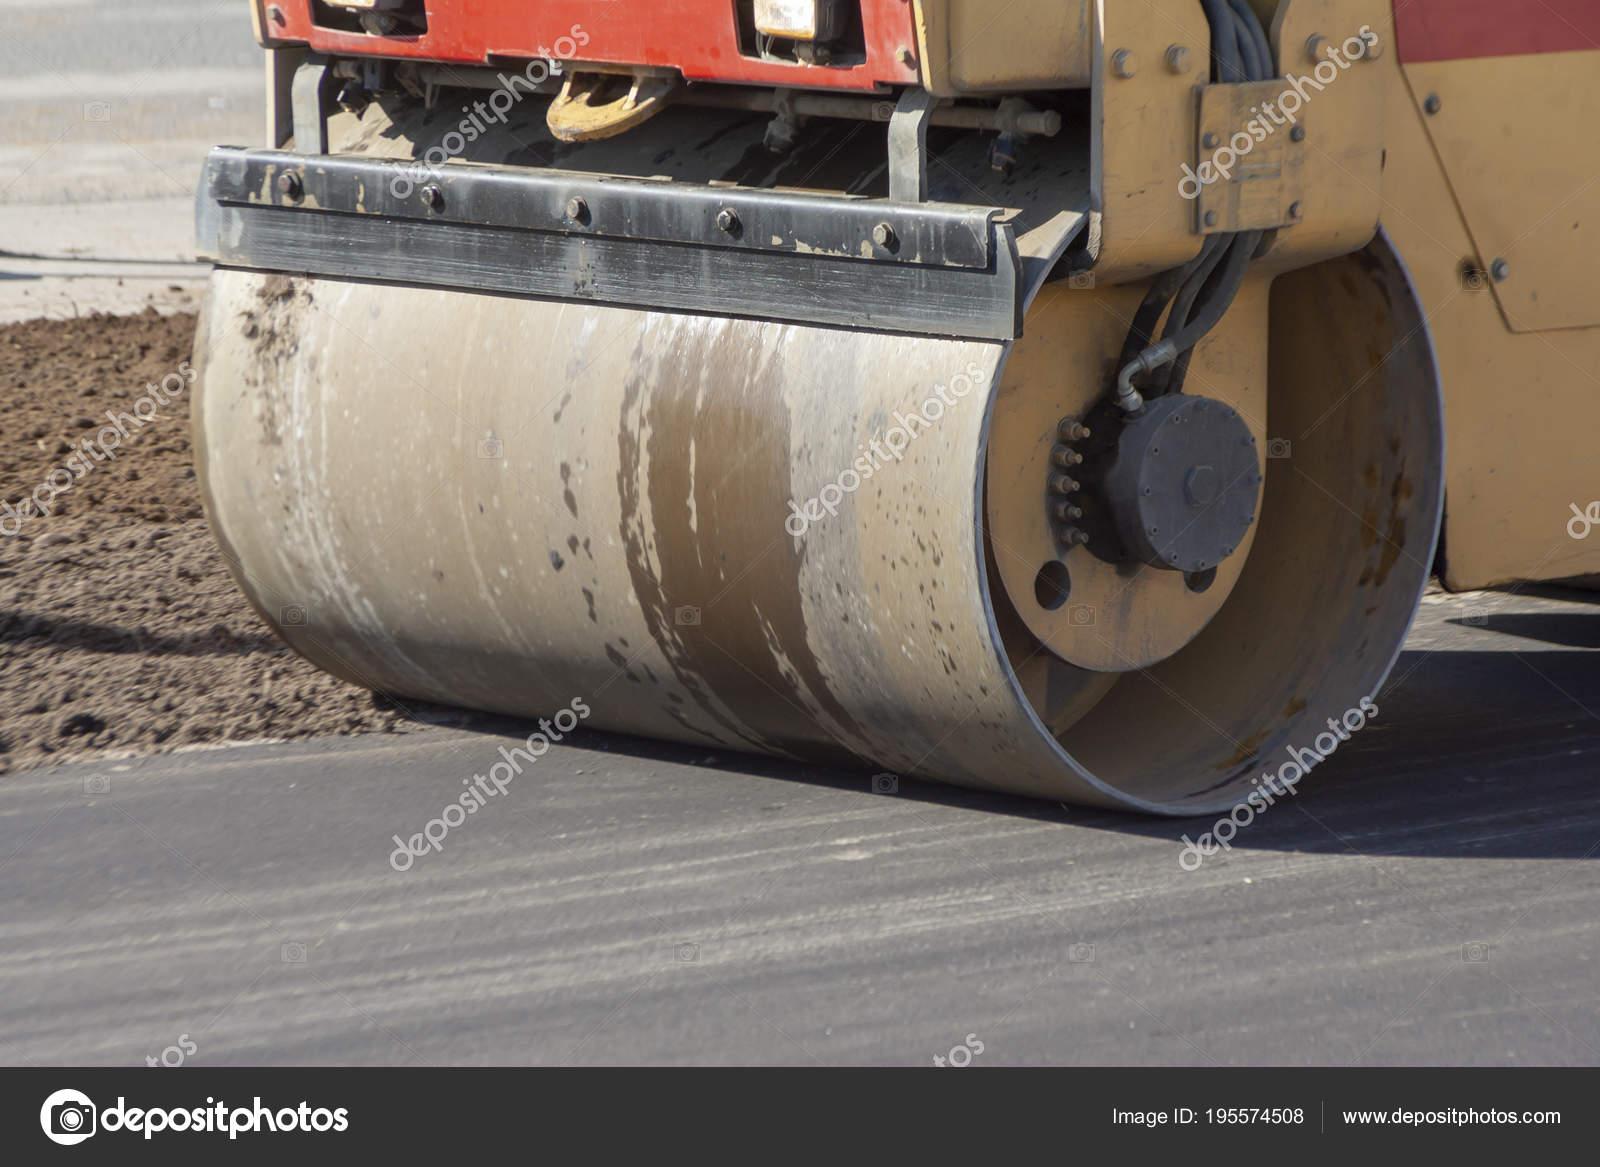 [C.J] A little bite Depositphotos_195574508-stock-photo-the-skating-rink-stamps-asphalt